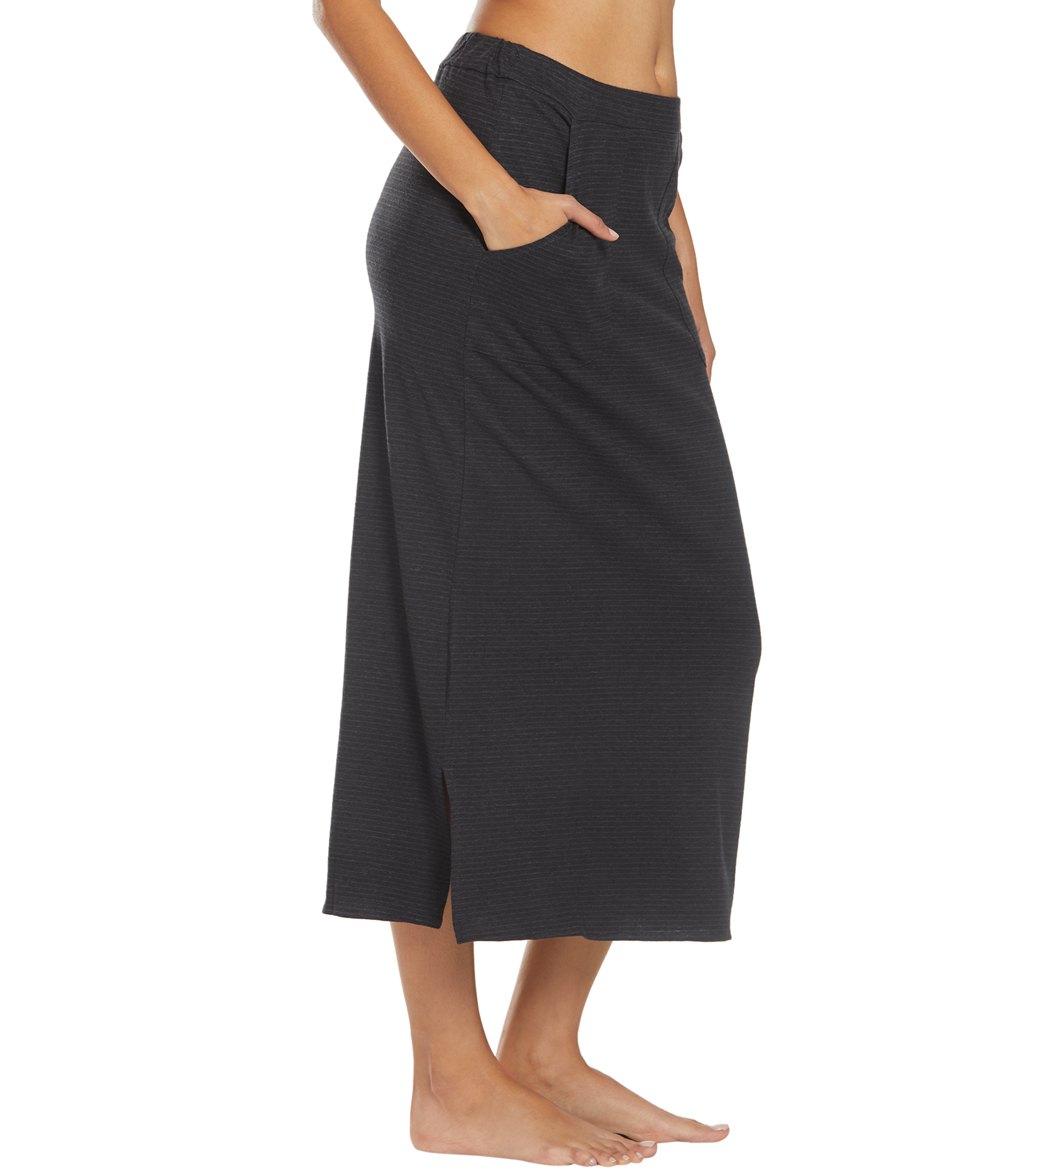 ca3bd40191 Prana Tulum Skirt at SwimOutlet.com - Free Shipping